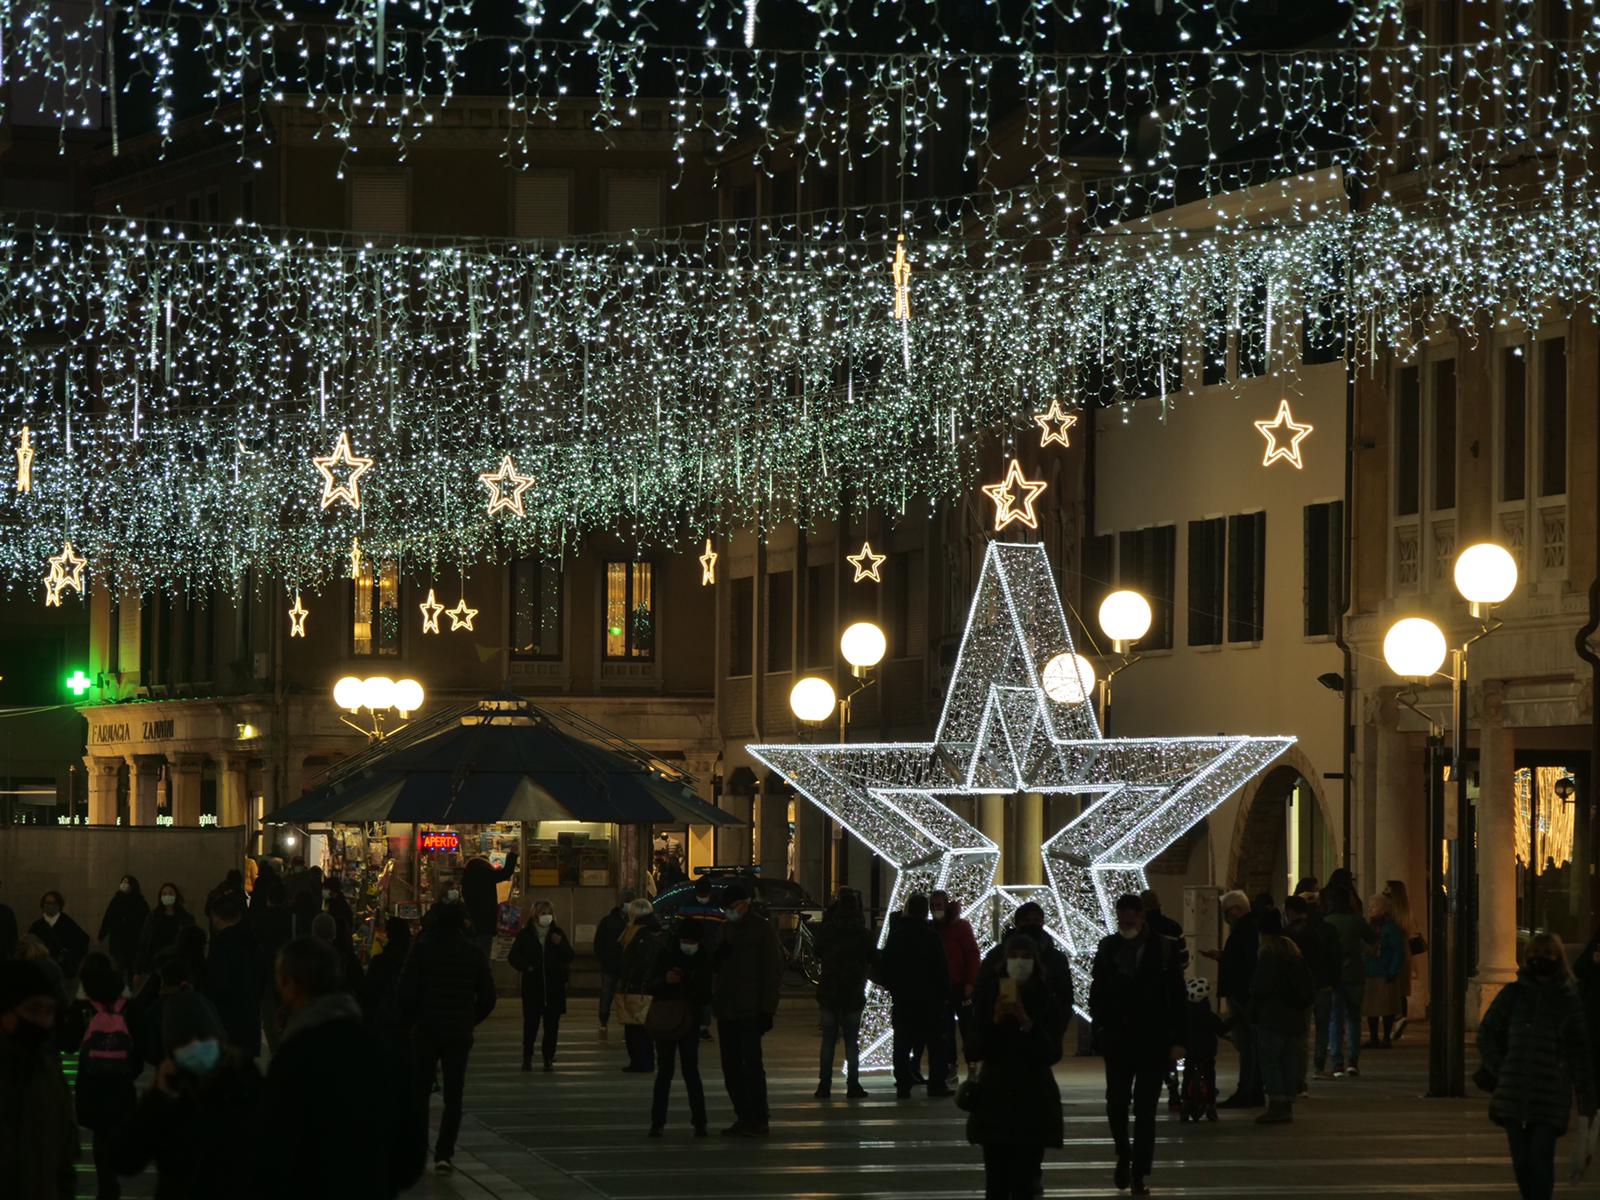 luci natale a venezia